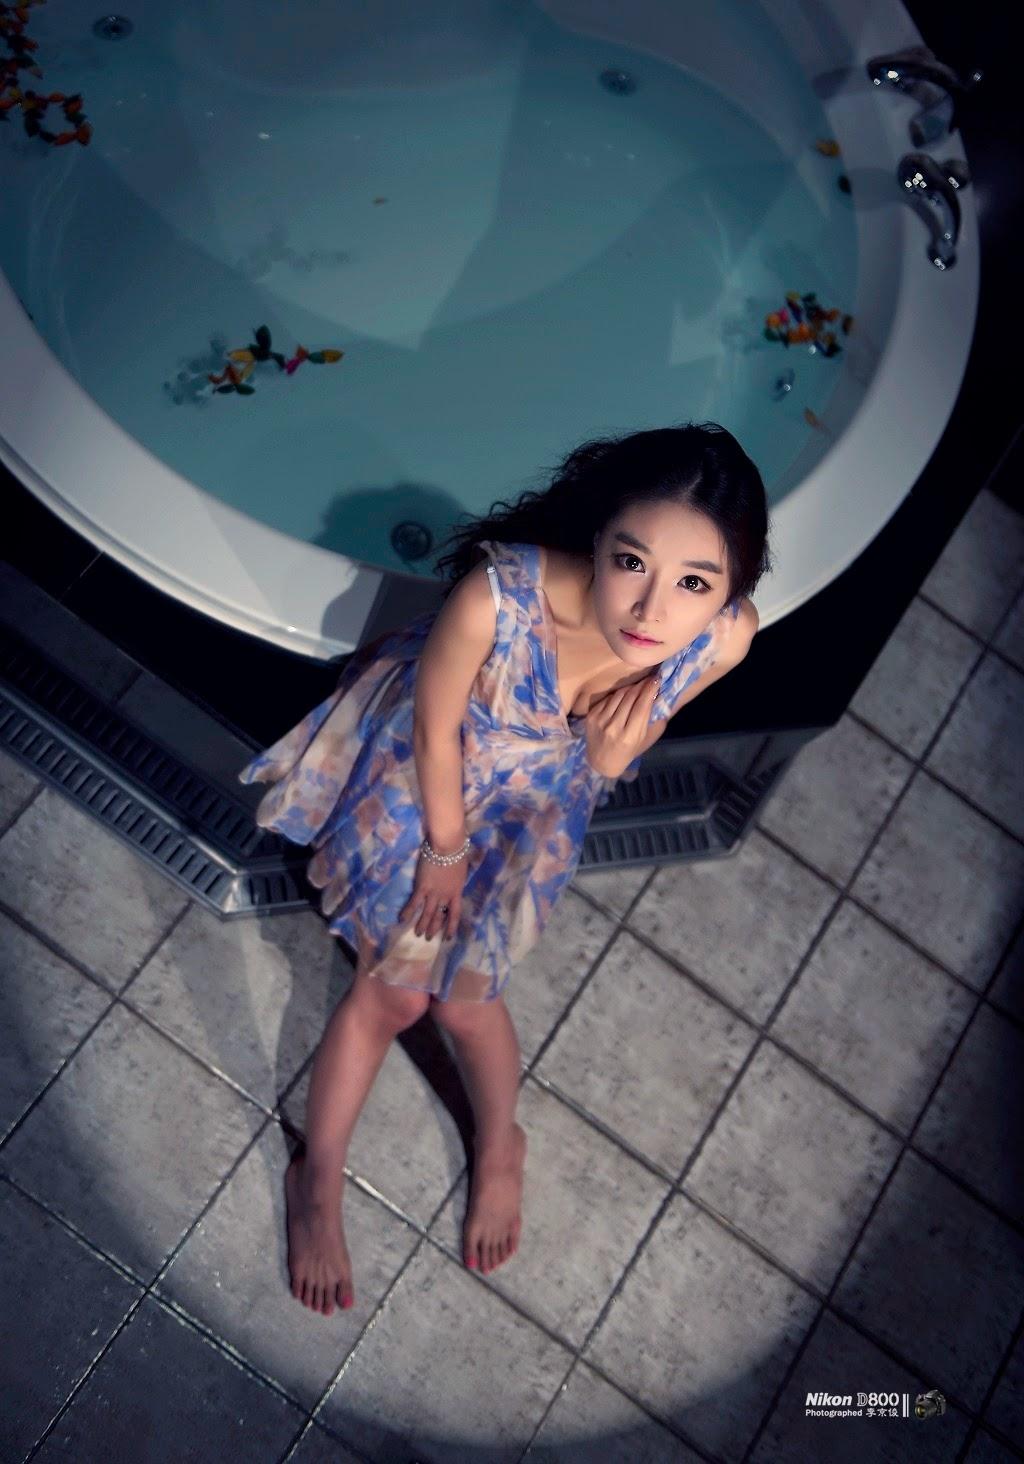 5 Lee Eun Seo - Spending Time in a Hotel - very cute asian girl-girlcute4u.blogspot.com